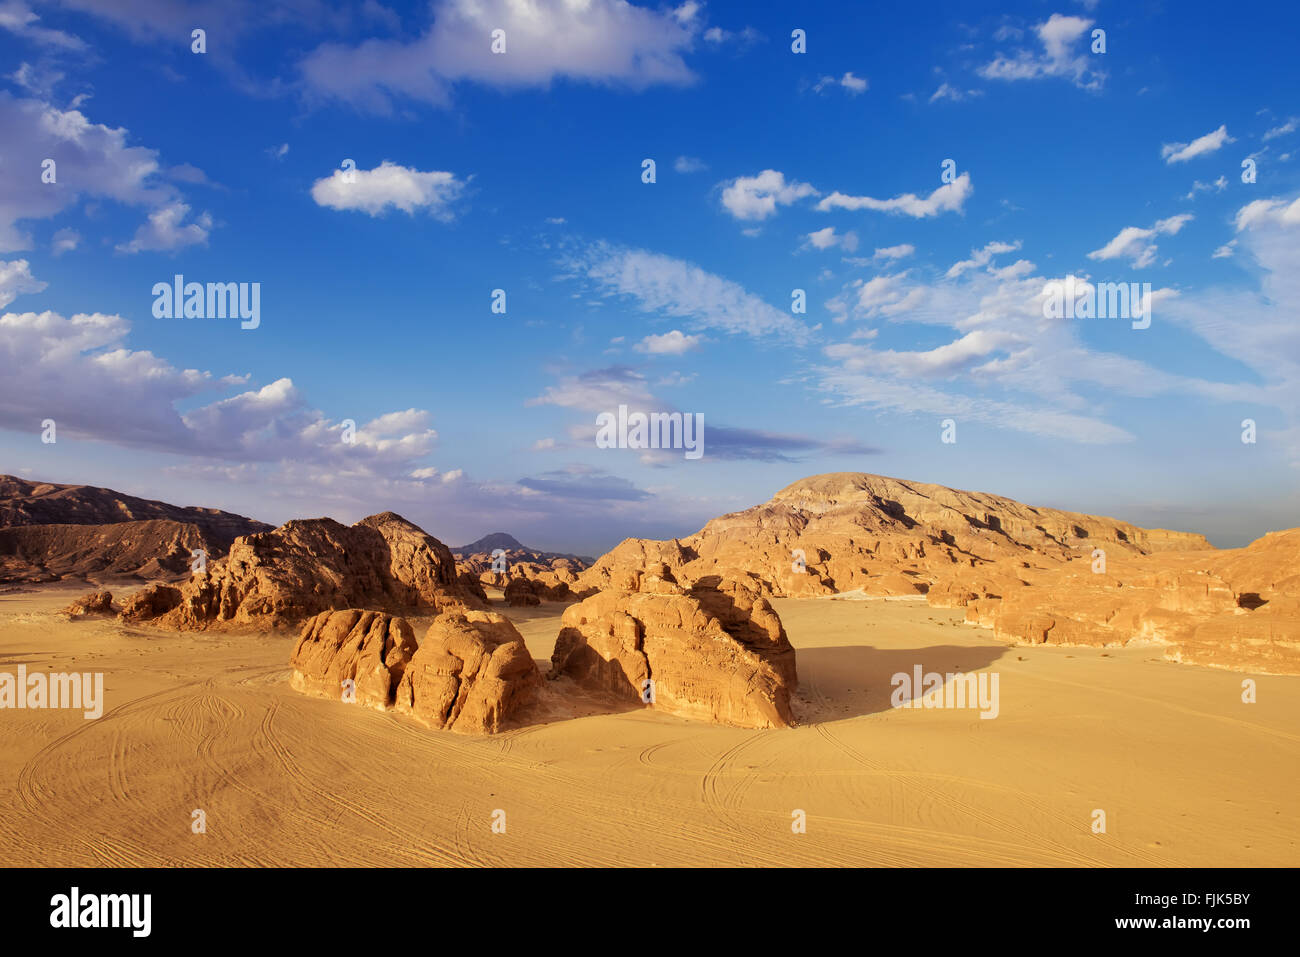 Désert du Sinaï Égypte voir Rocky Hills Blue sky Photo Stock